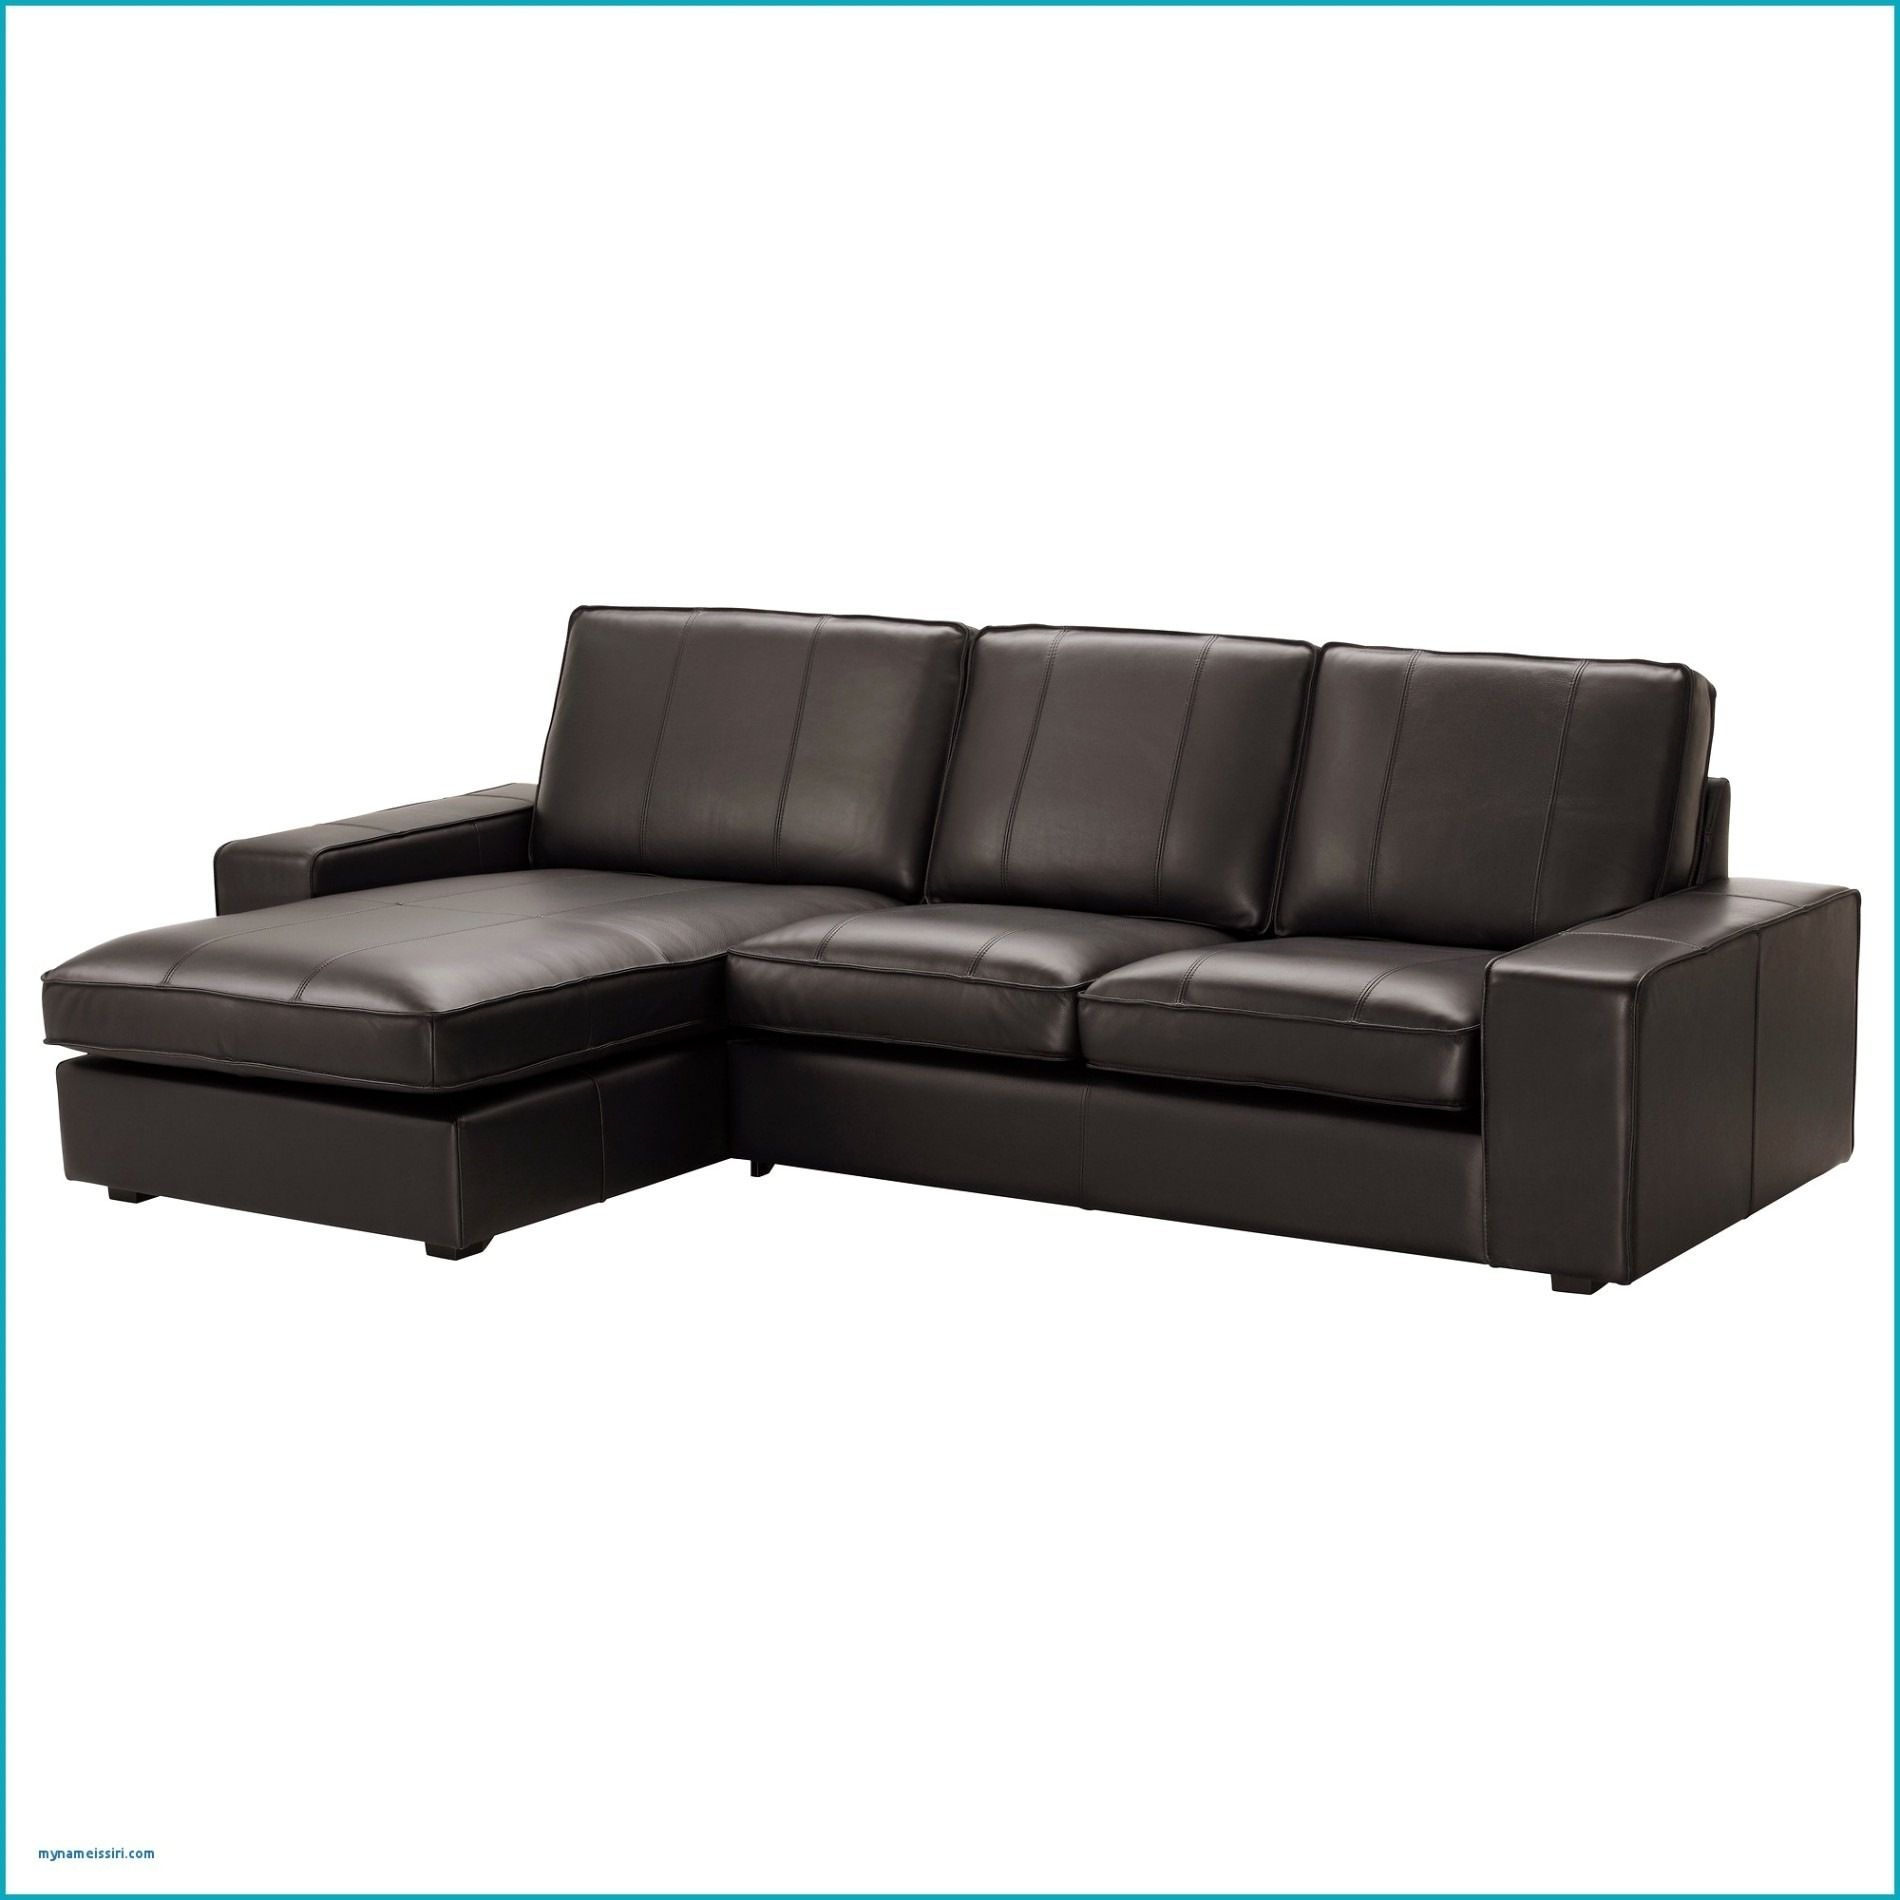 Klein Comfort Sleeper Sofa Most Comfortable Sleeper Sofa Comfort Sleeper Sleeper Sofa Comfortable